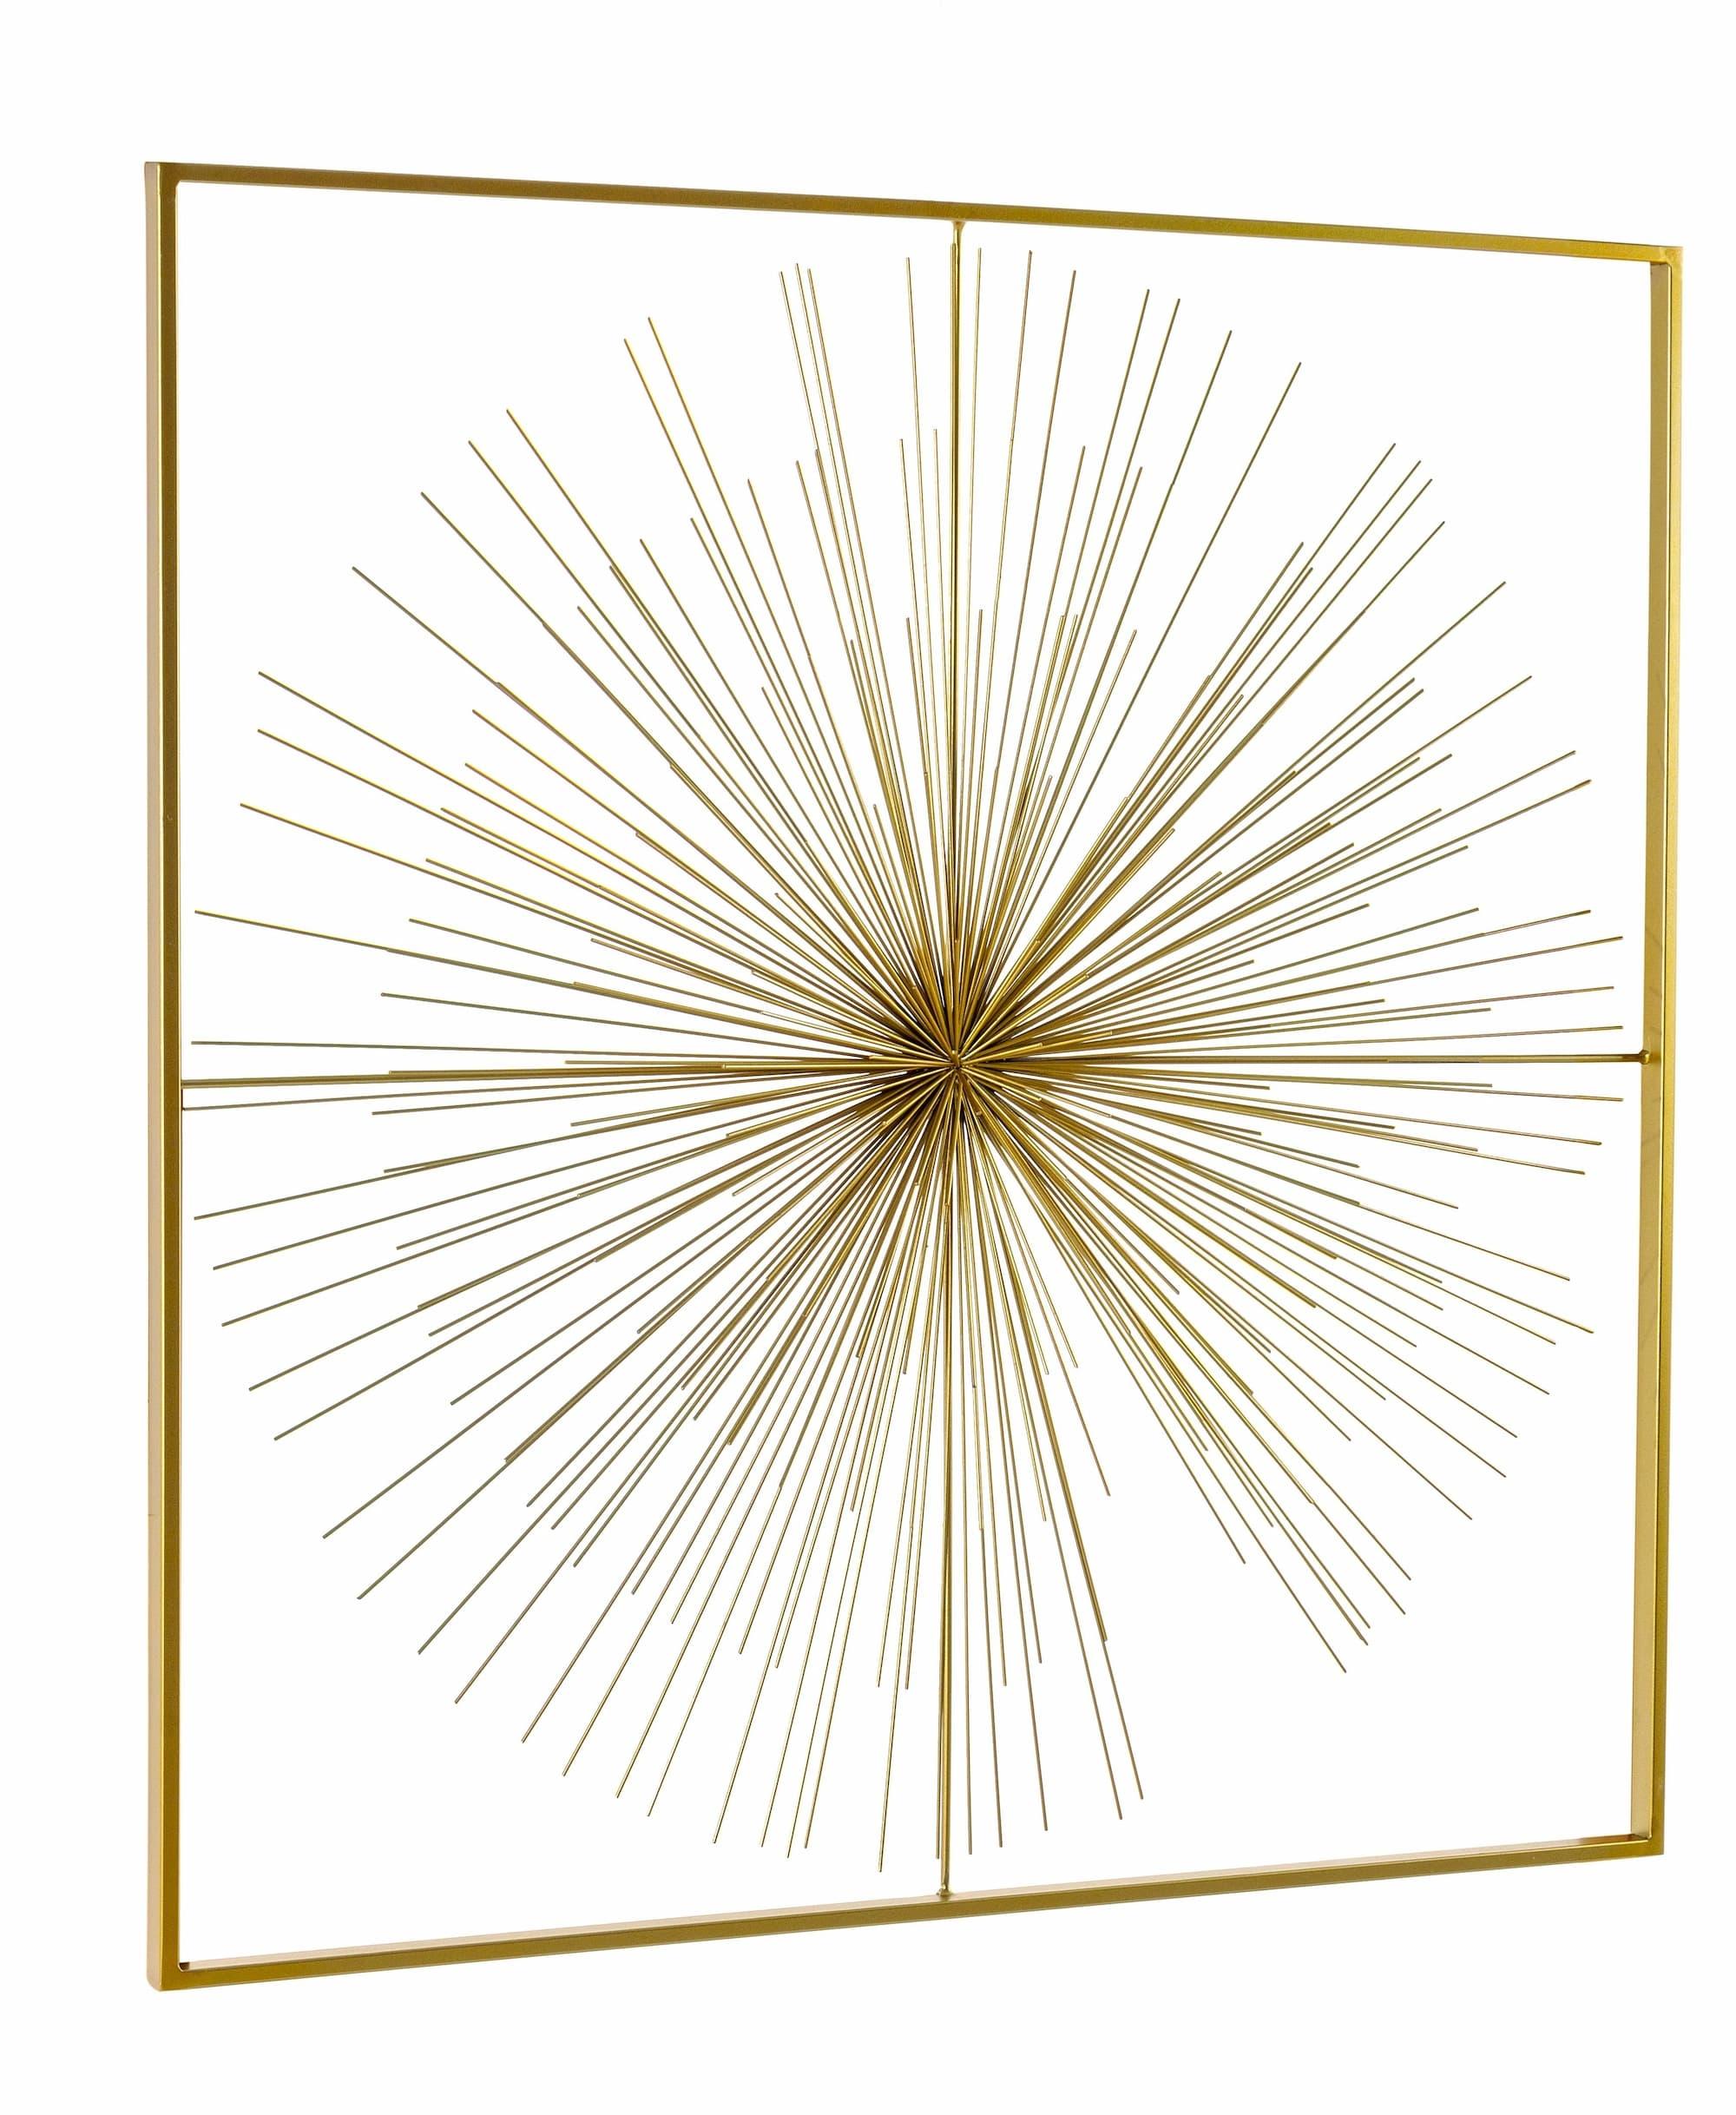 Decoratiune de perete din metal Auriel Large Auriu, l90xA6,5xH90 cm poza